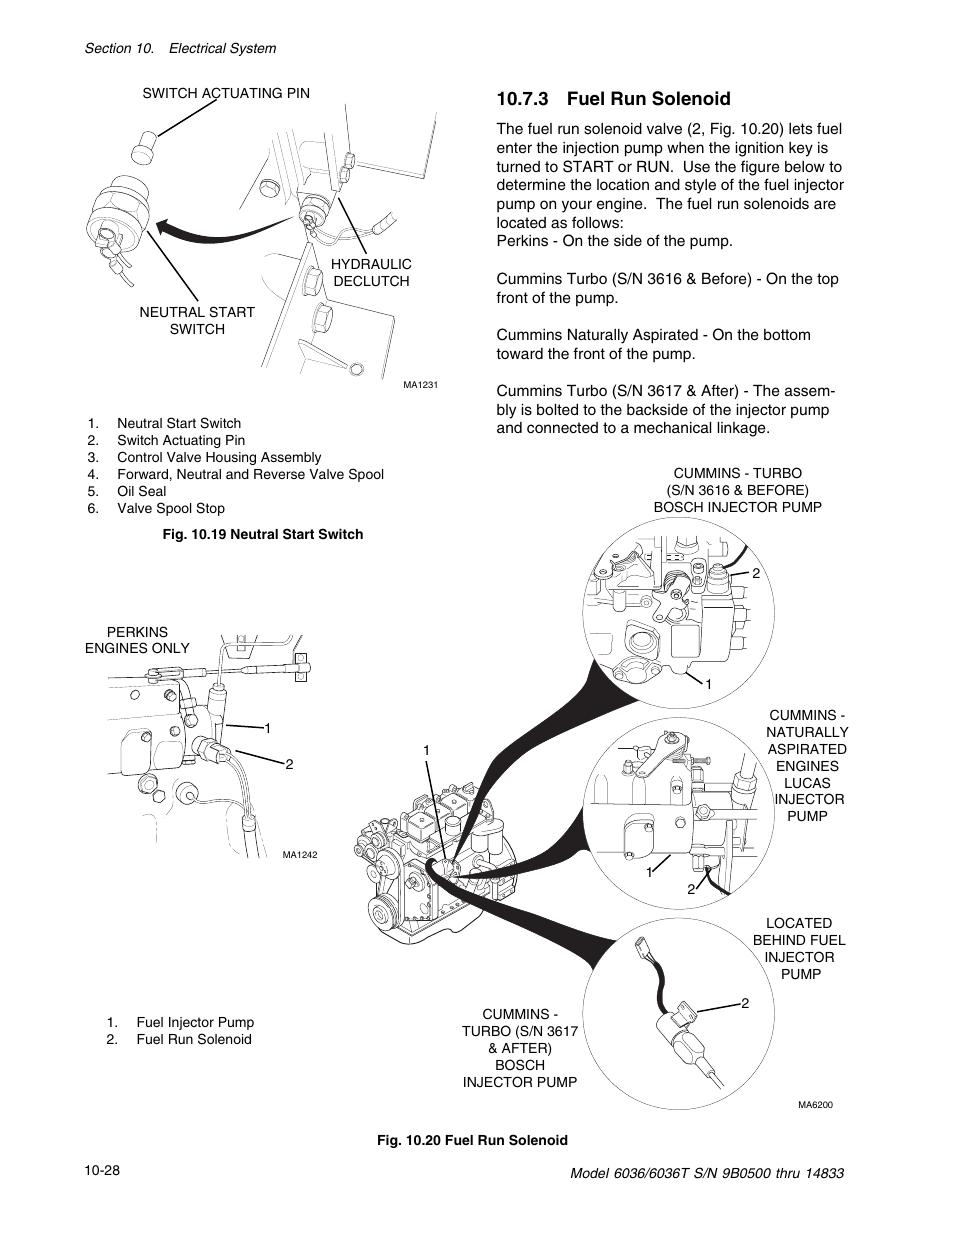 medium resolution of 3 fuel run solenoid skytrak 6036 service manual user manual page 290 342